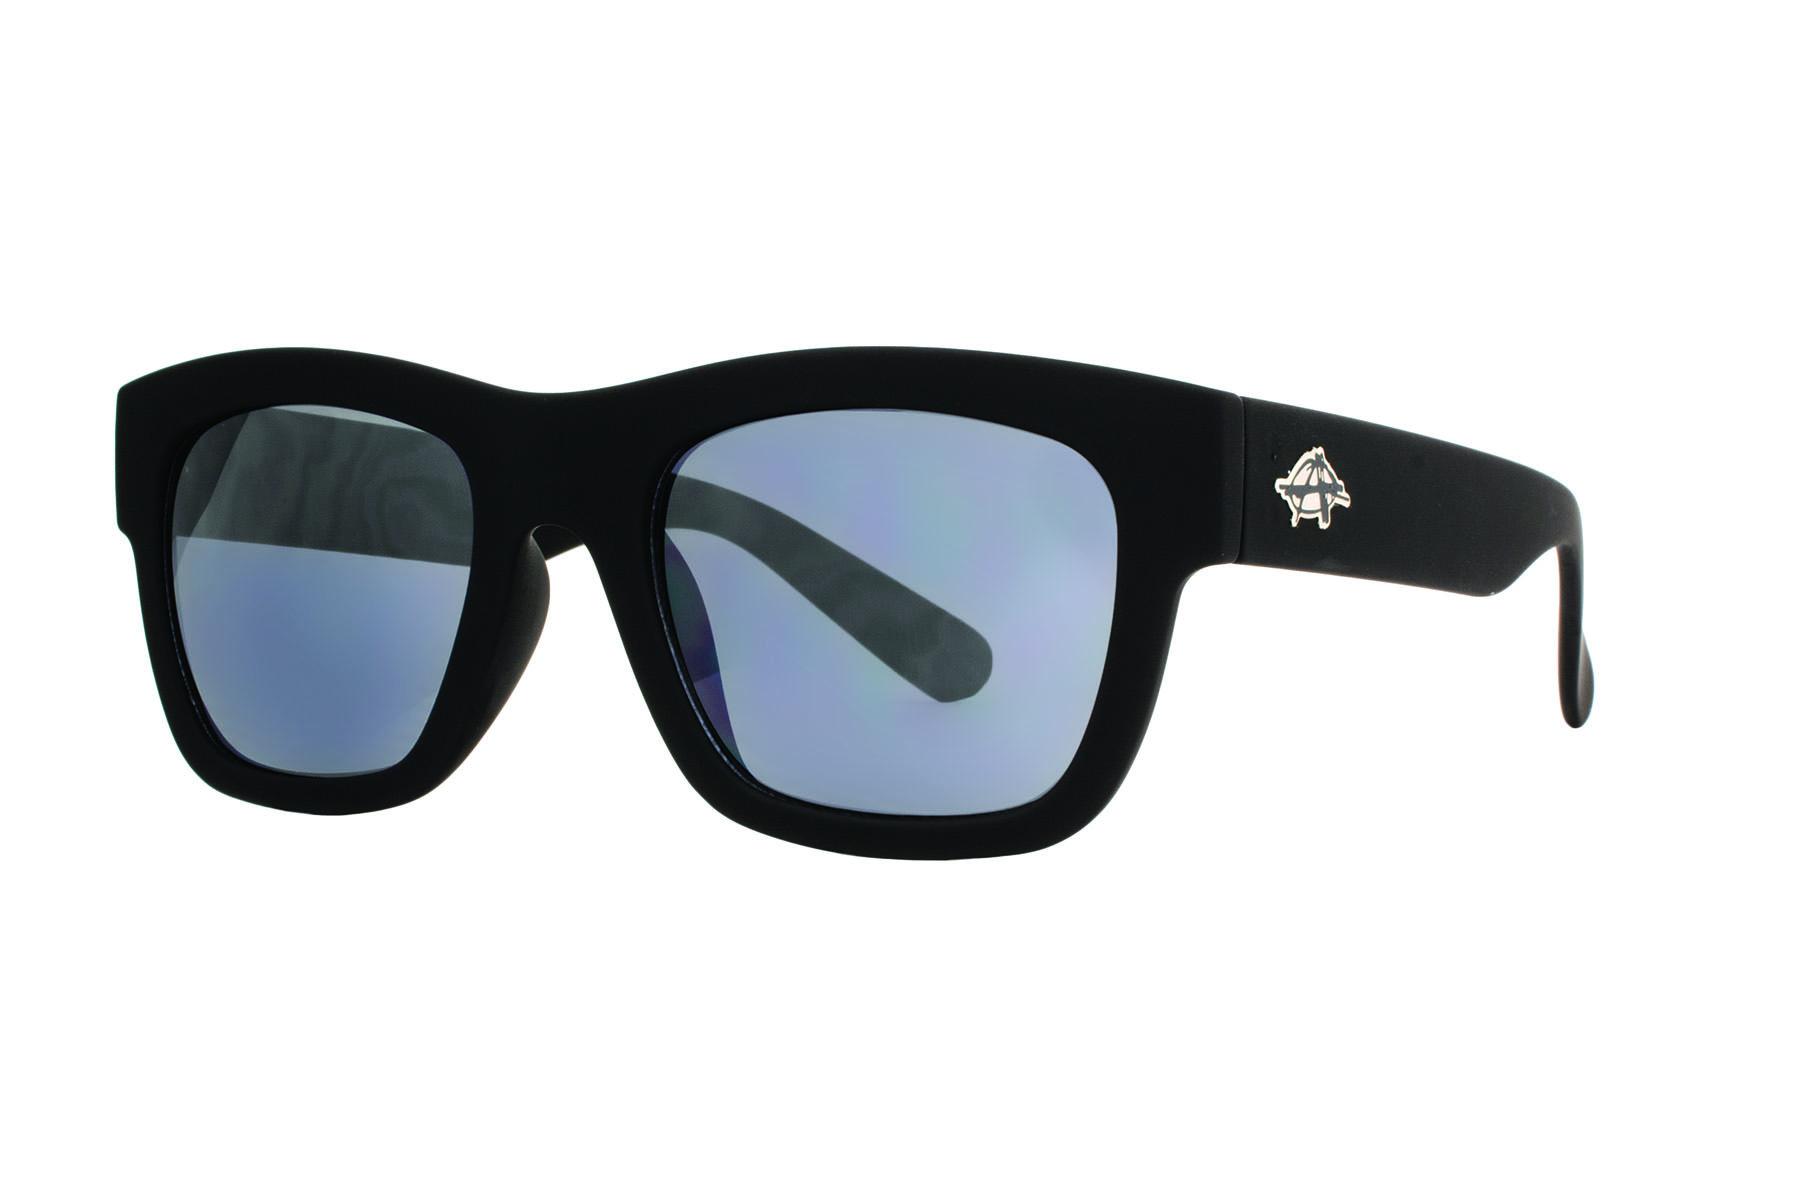 9b0b68c66a Anarchy Nimble Whiz Sunglasses